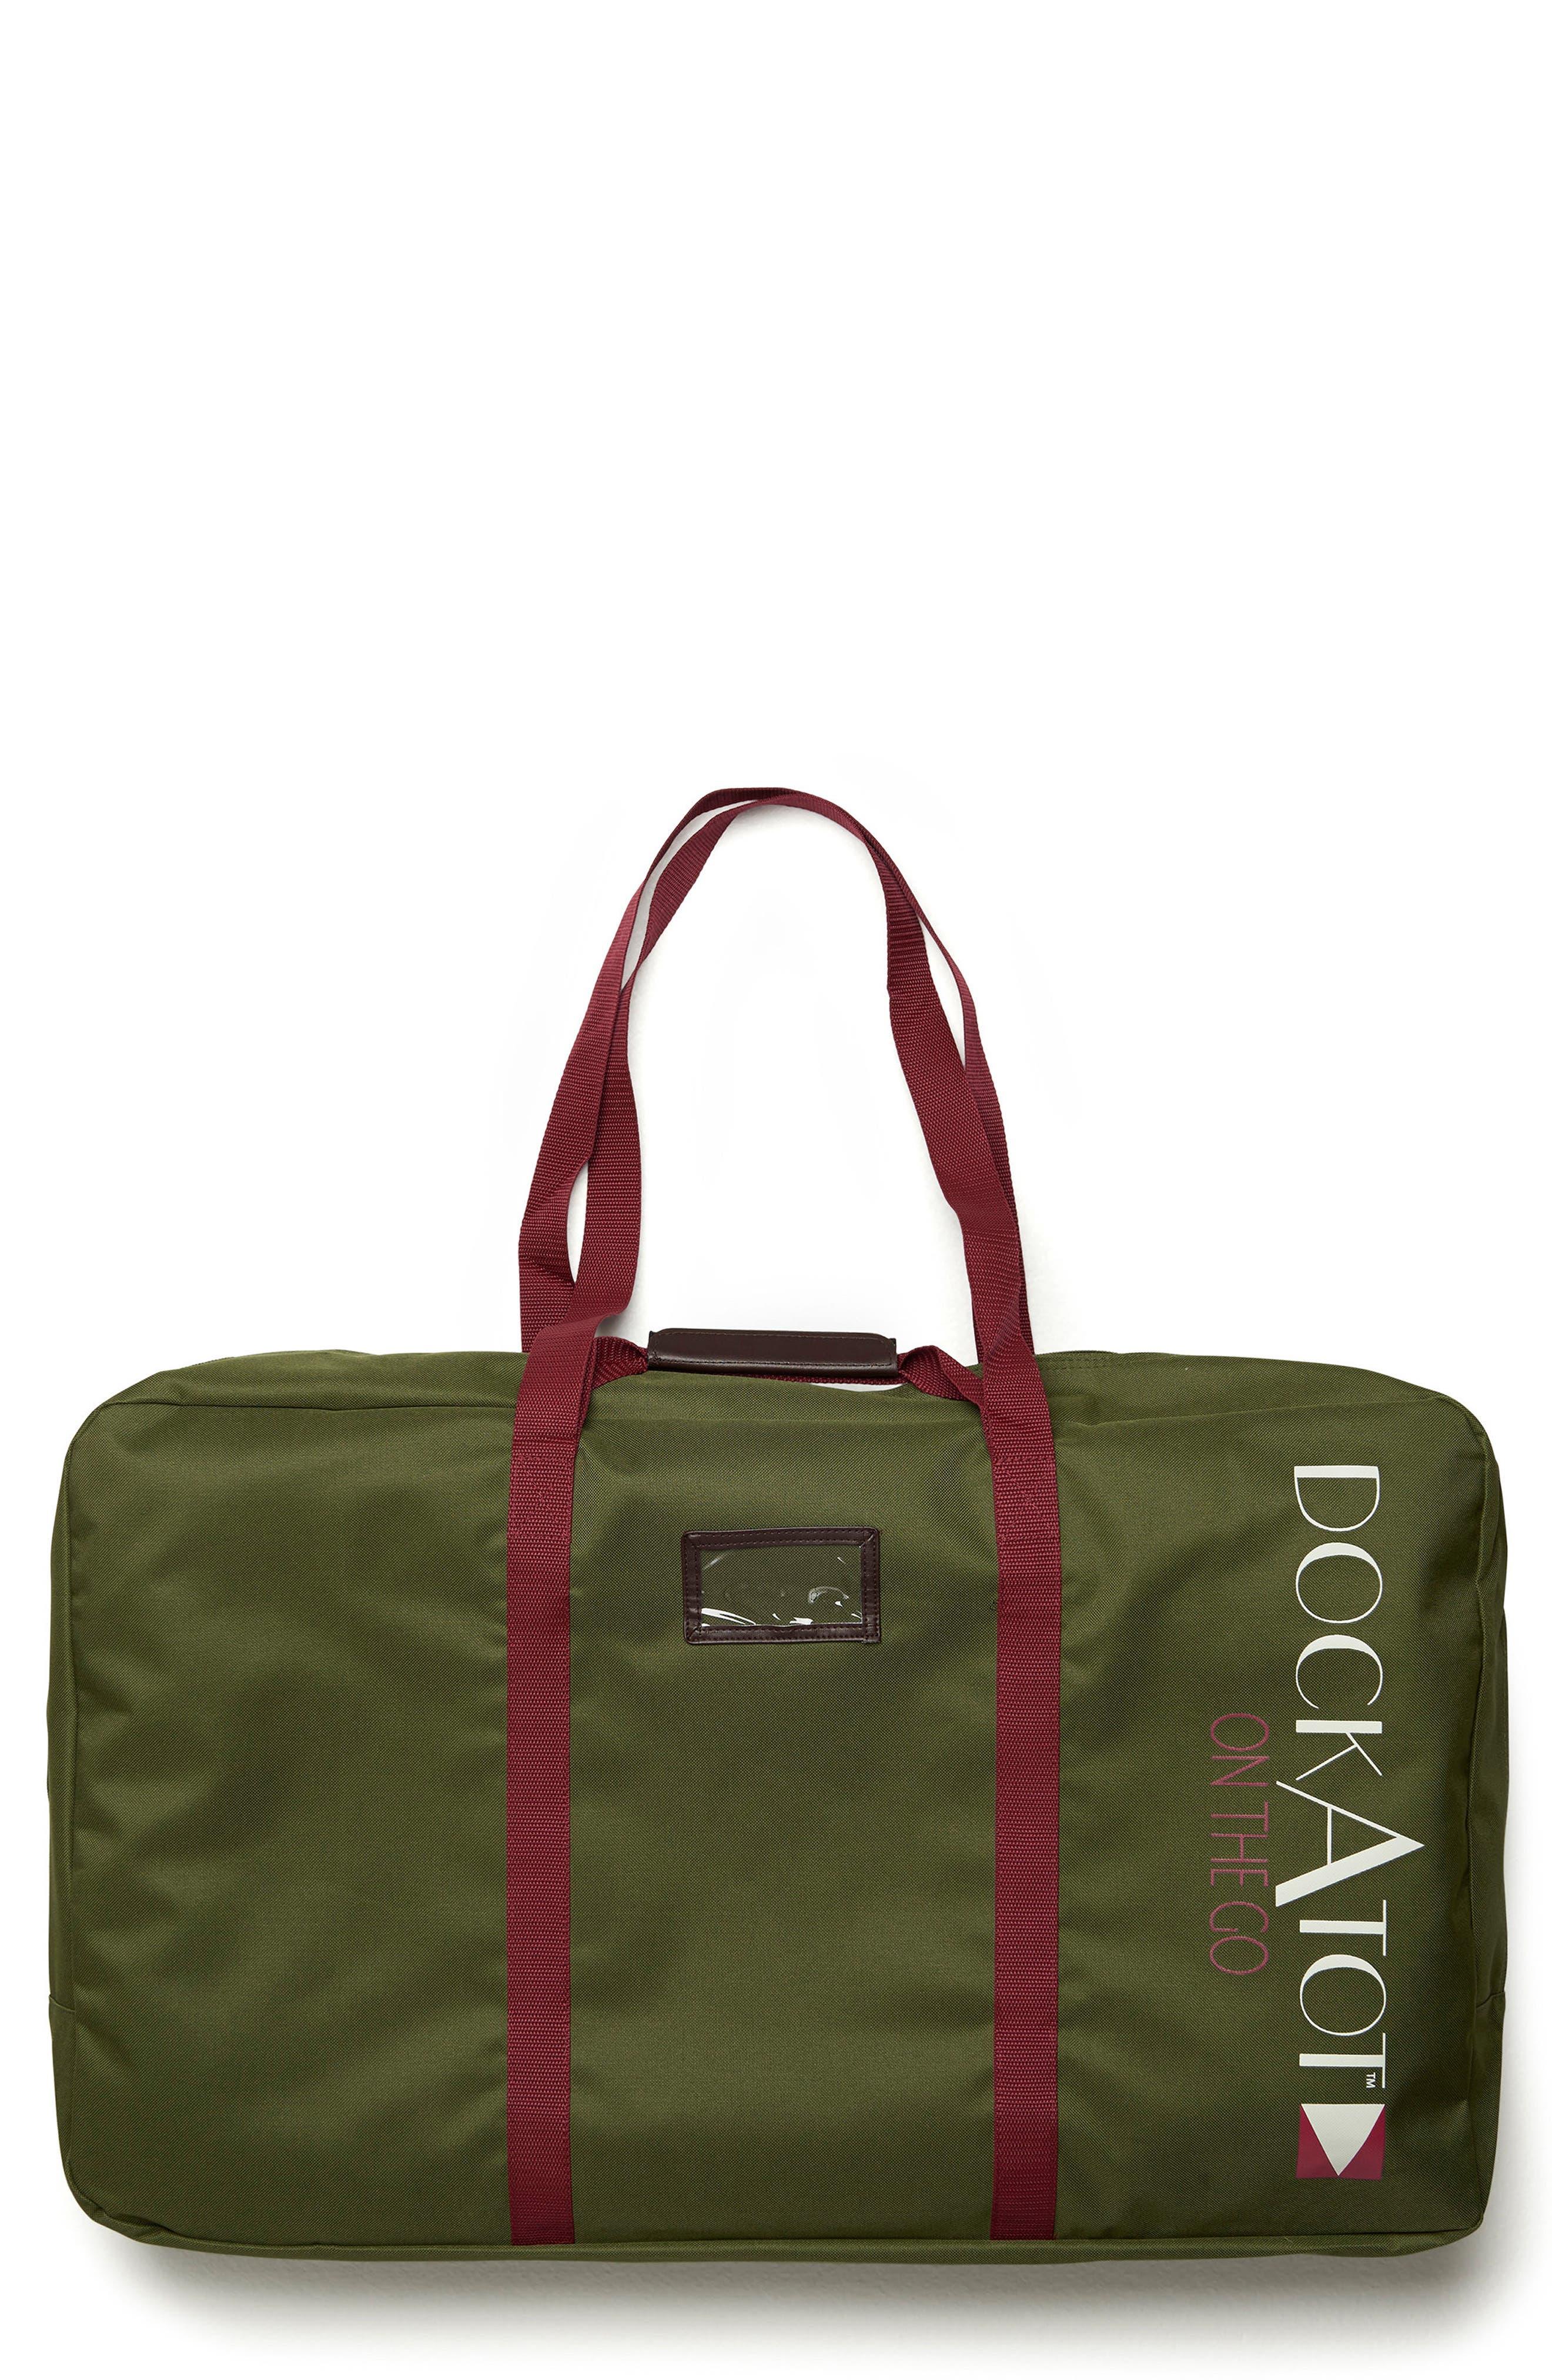 Main Image - DockATot Deluxe Transport Bag